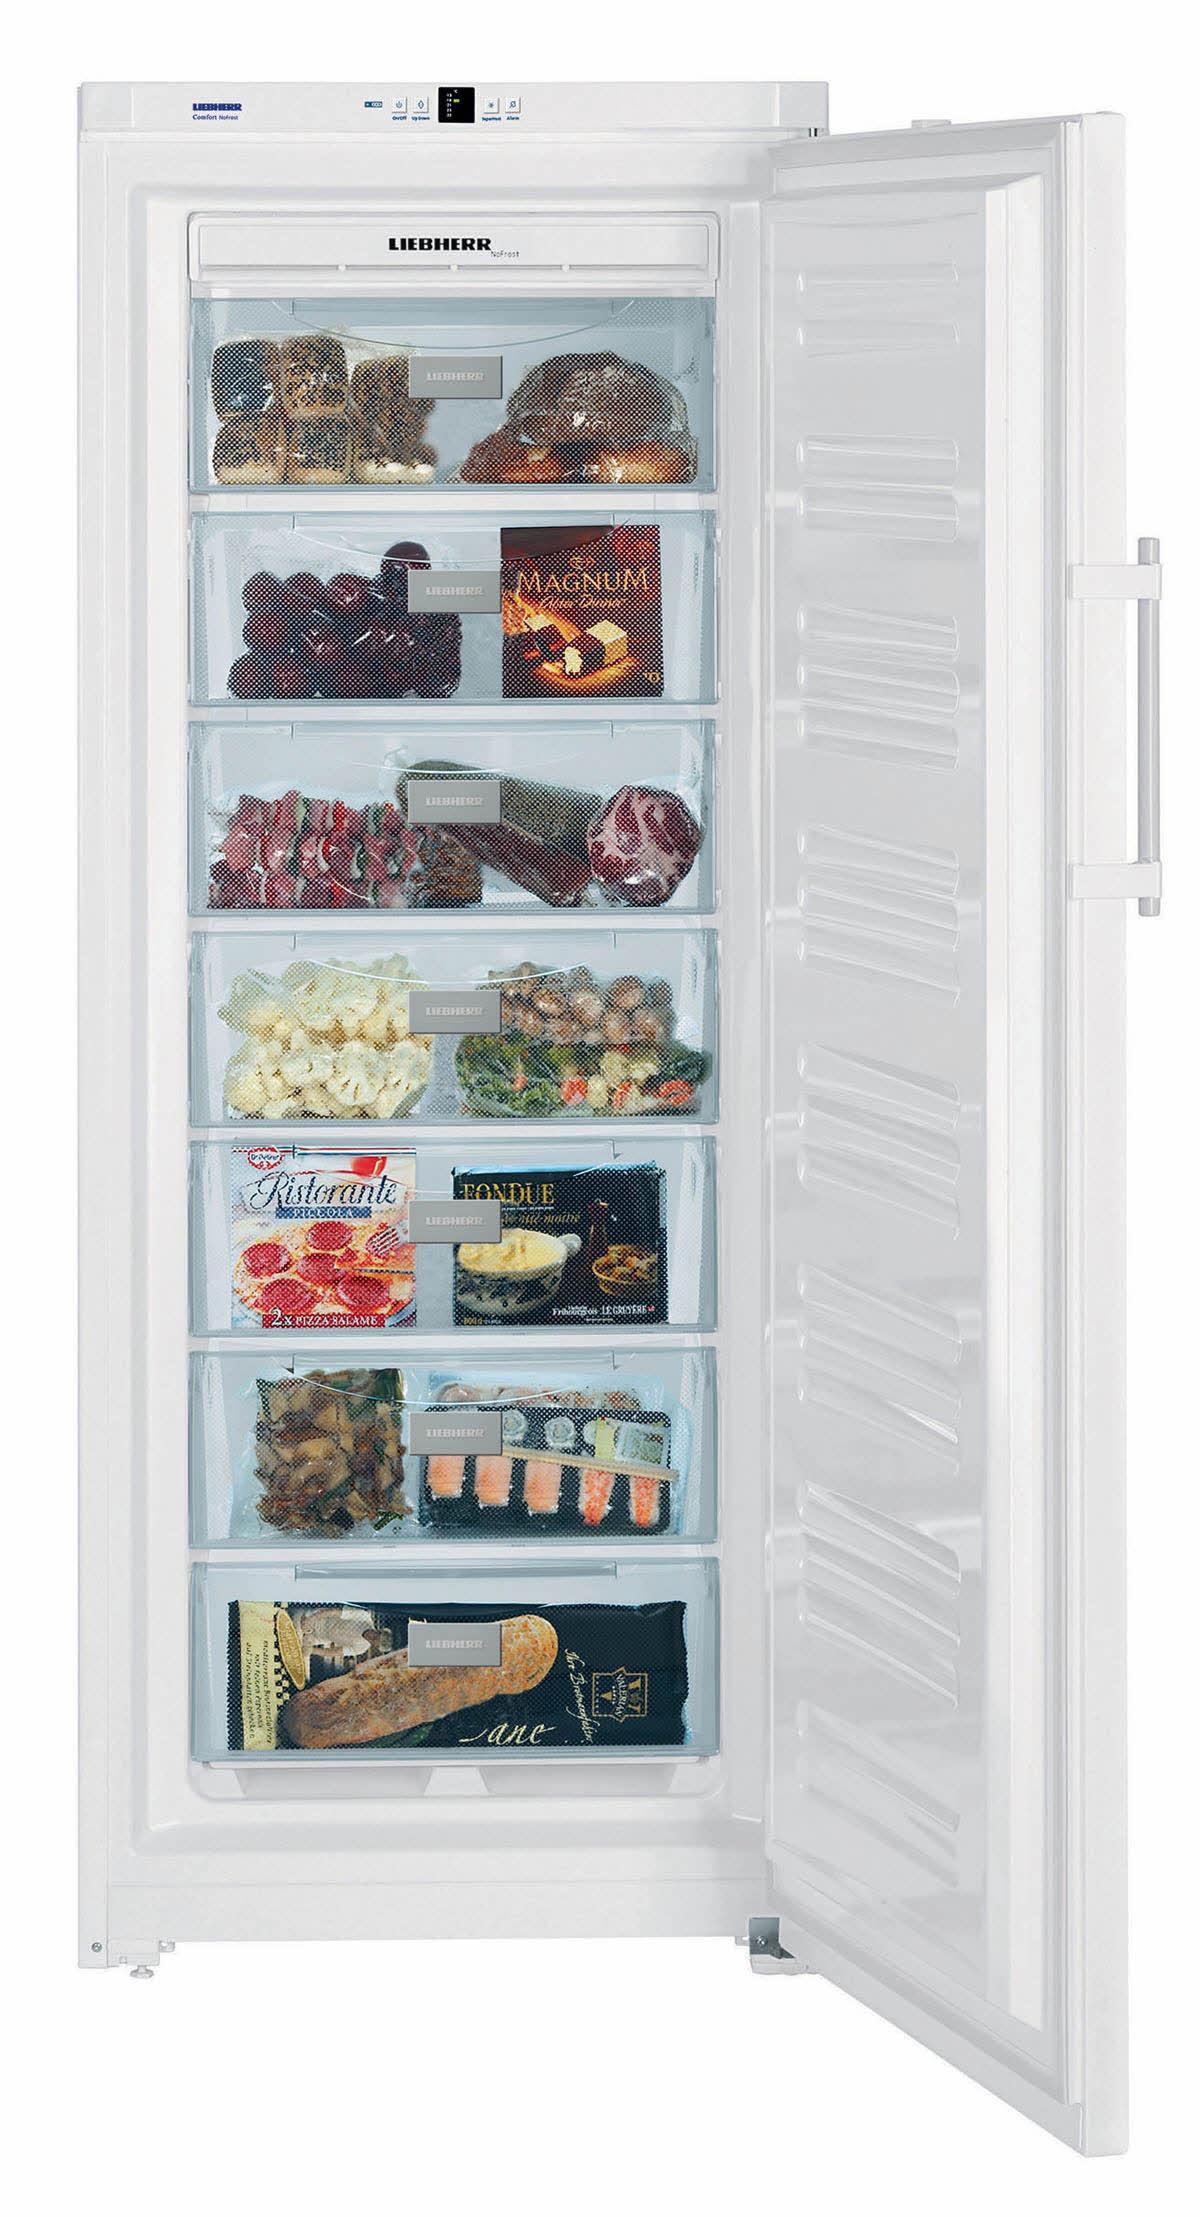 Морозильник LIEBHERR GN 3613-20 001 от Ravta